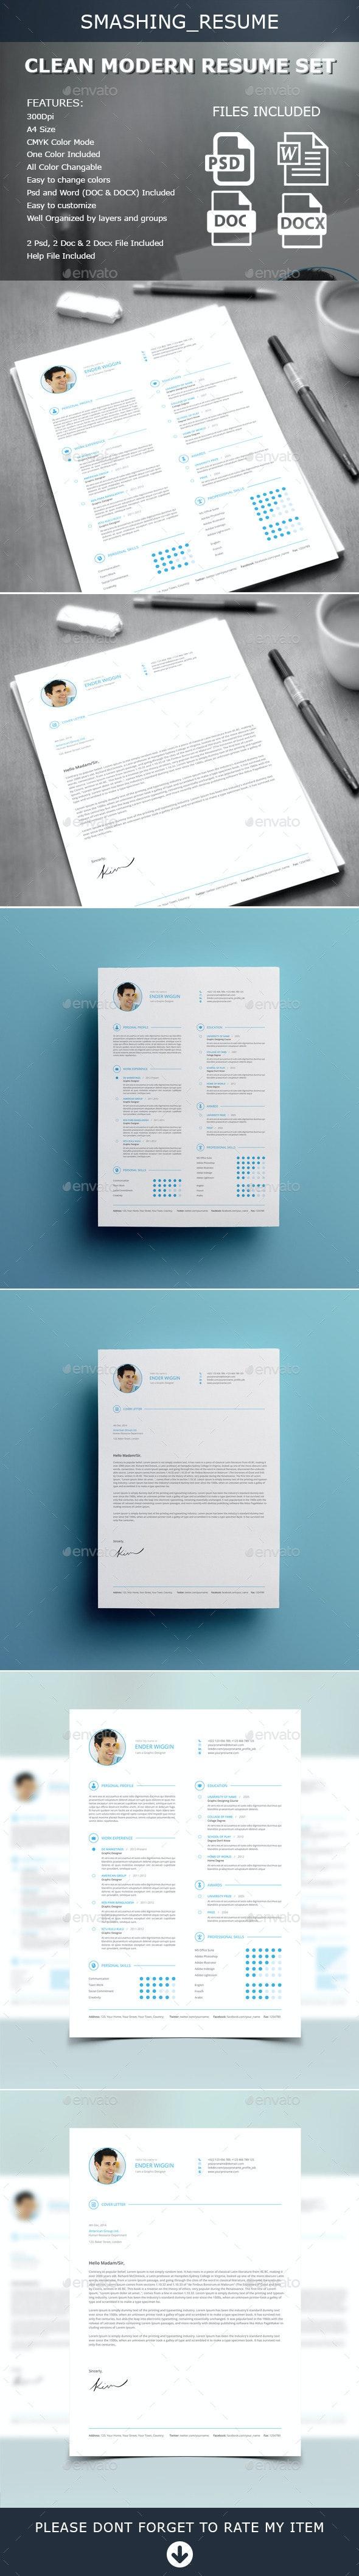 Clean Modern Resume Set - Resumes Stationery